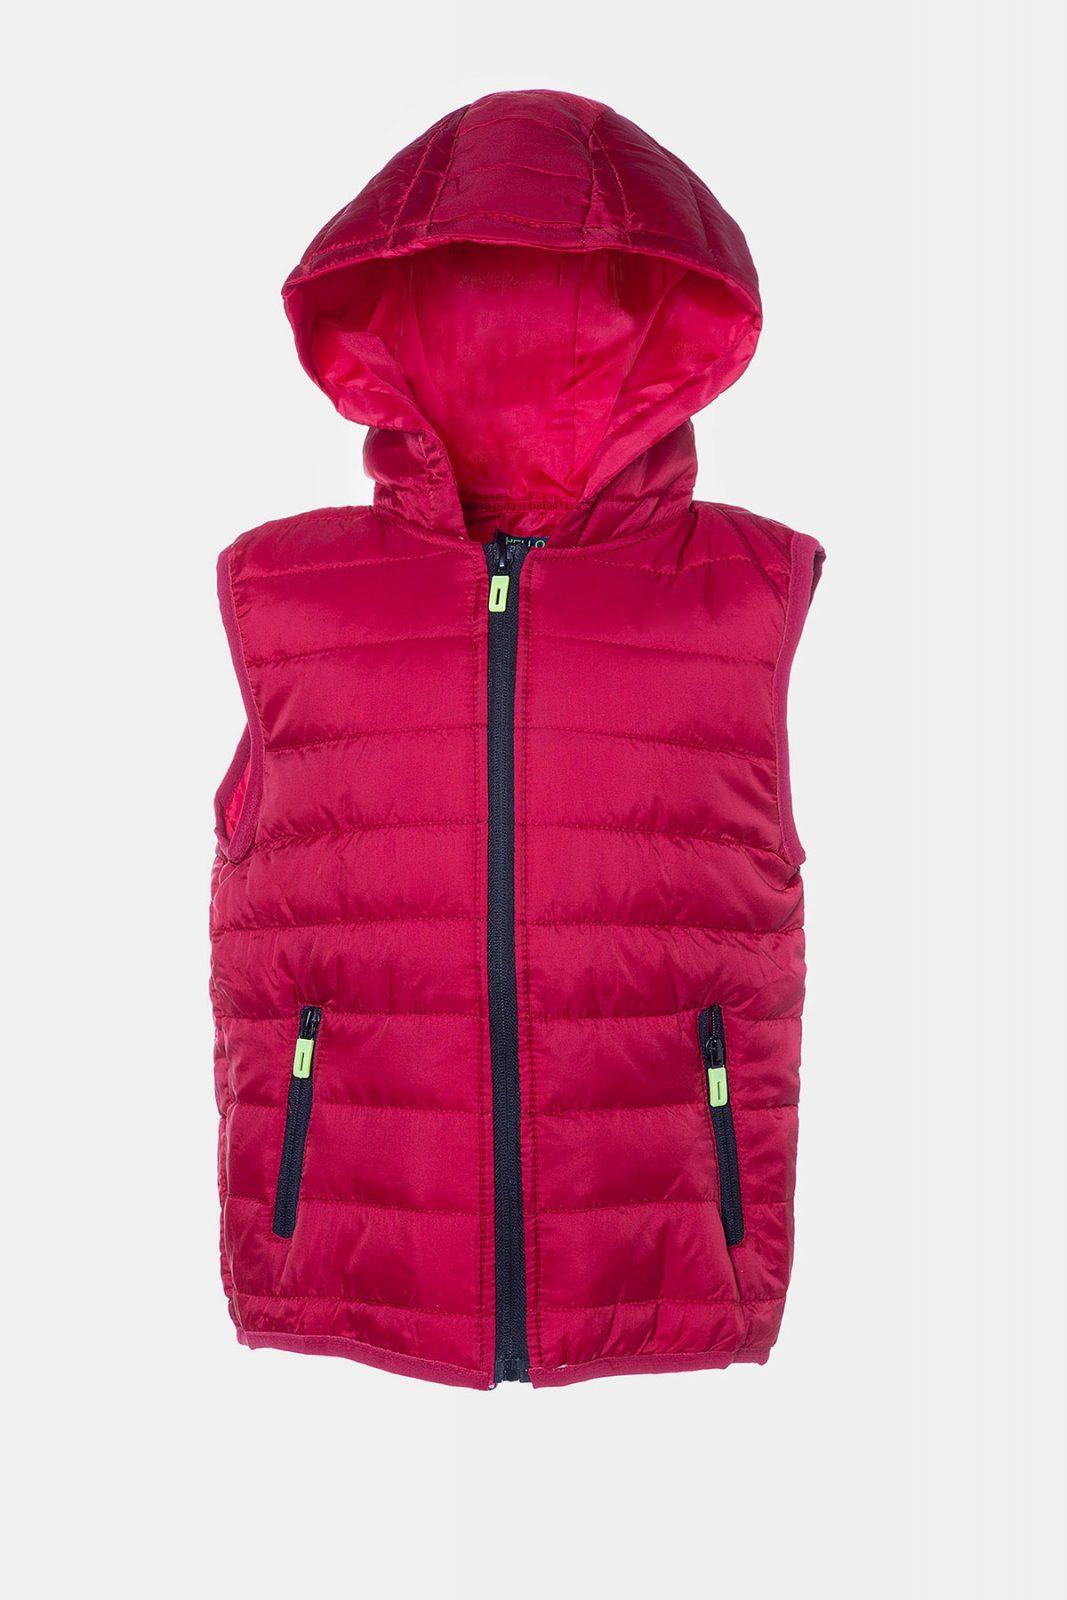 60fb128b9cc Κόκκινο παιδικό αμάνικο μπουφάν - Ersas Παιδικά, Βρεφικά Ρούχα